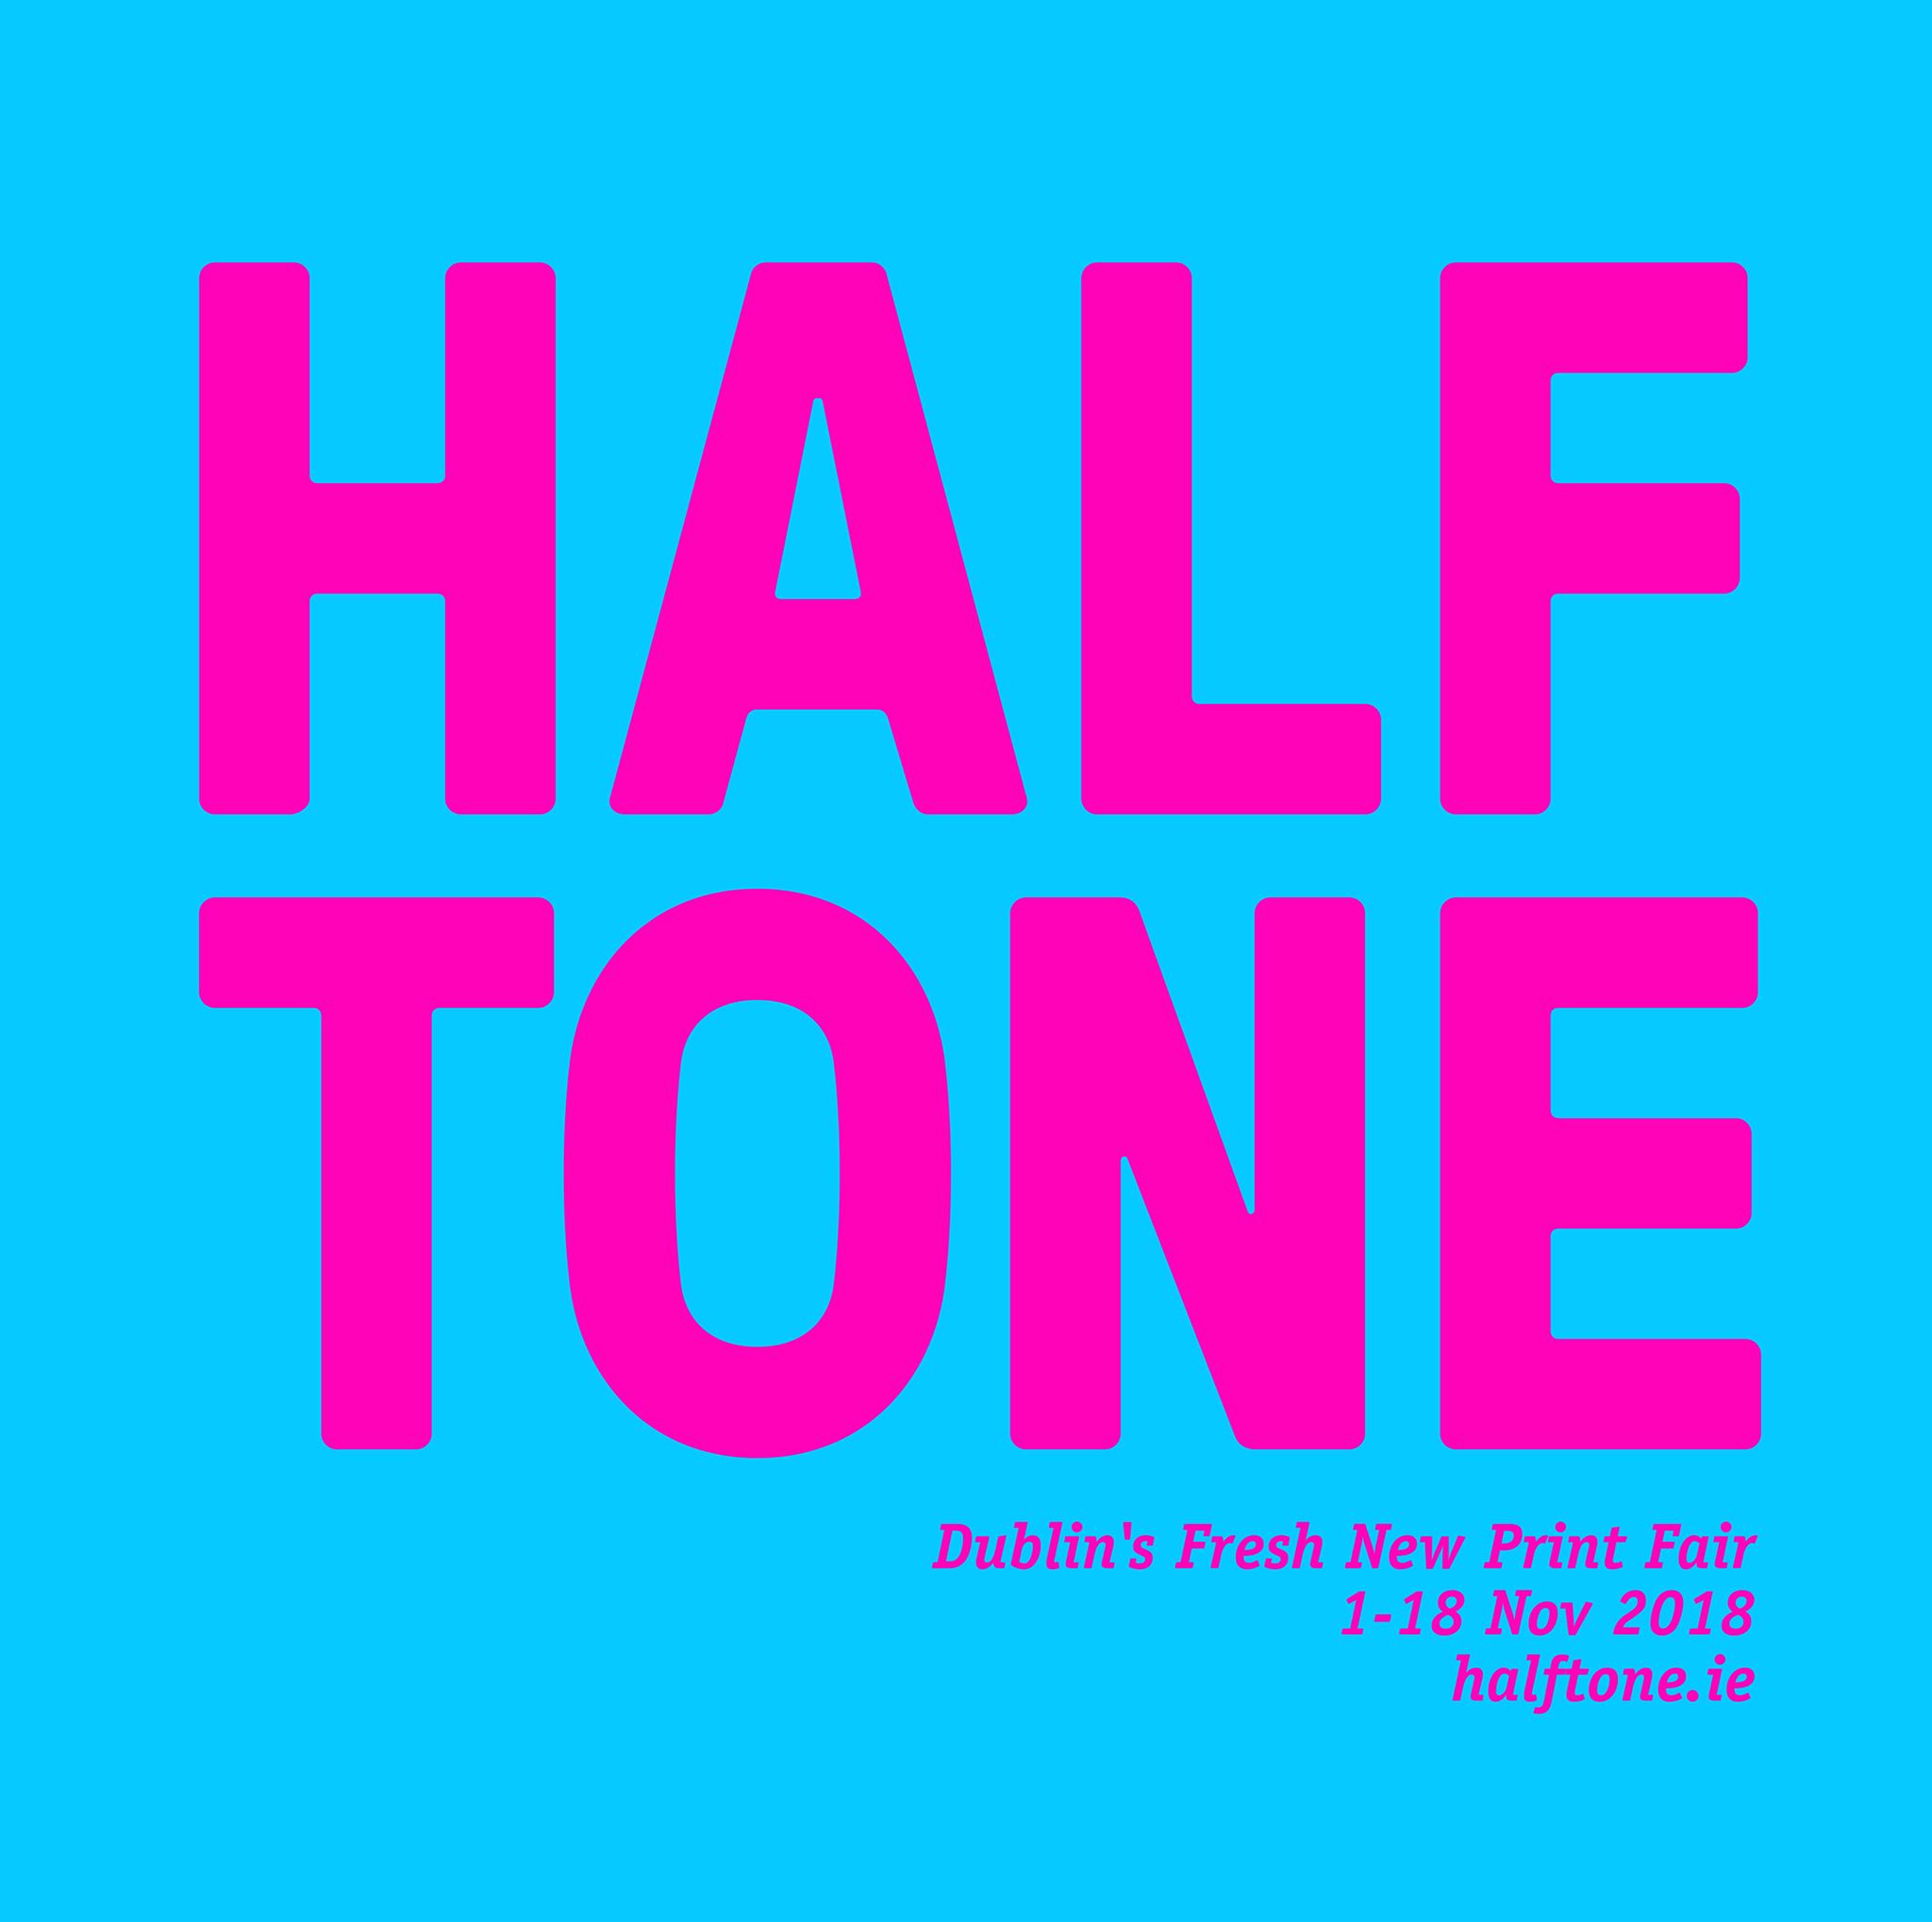 Halftione - Dublin's Fresh New Print Fair 1-18 Nov 2018